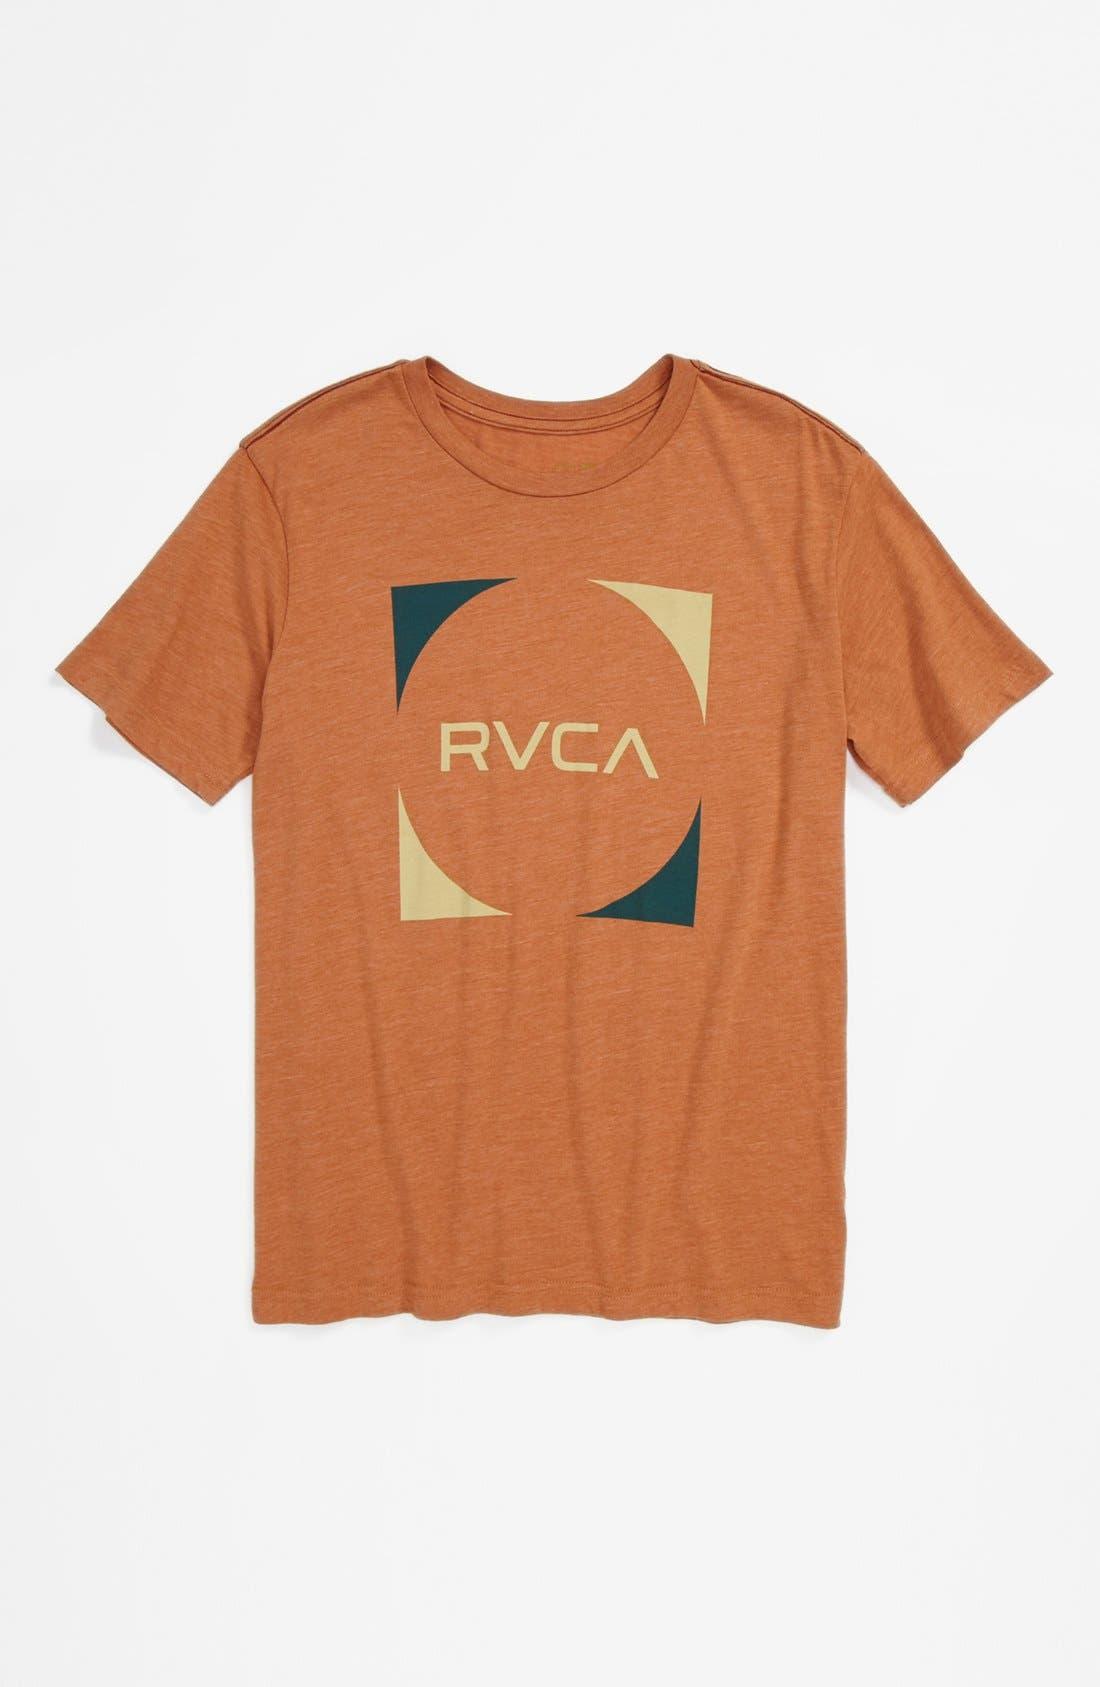 Alternate Image 1 Selected - RVCA 'Baller' T-Shirt (Big Boys)